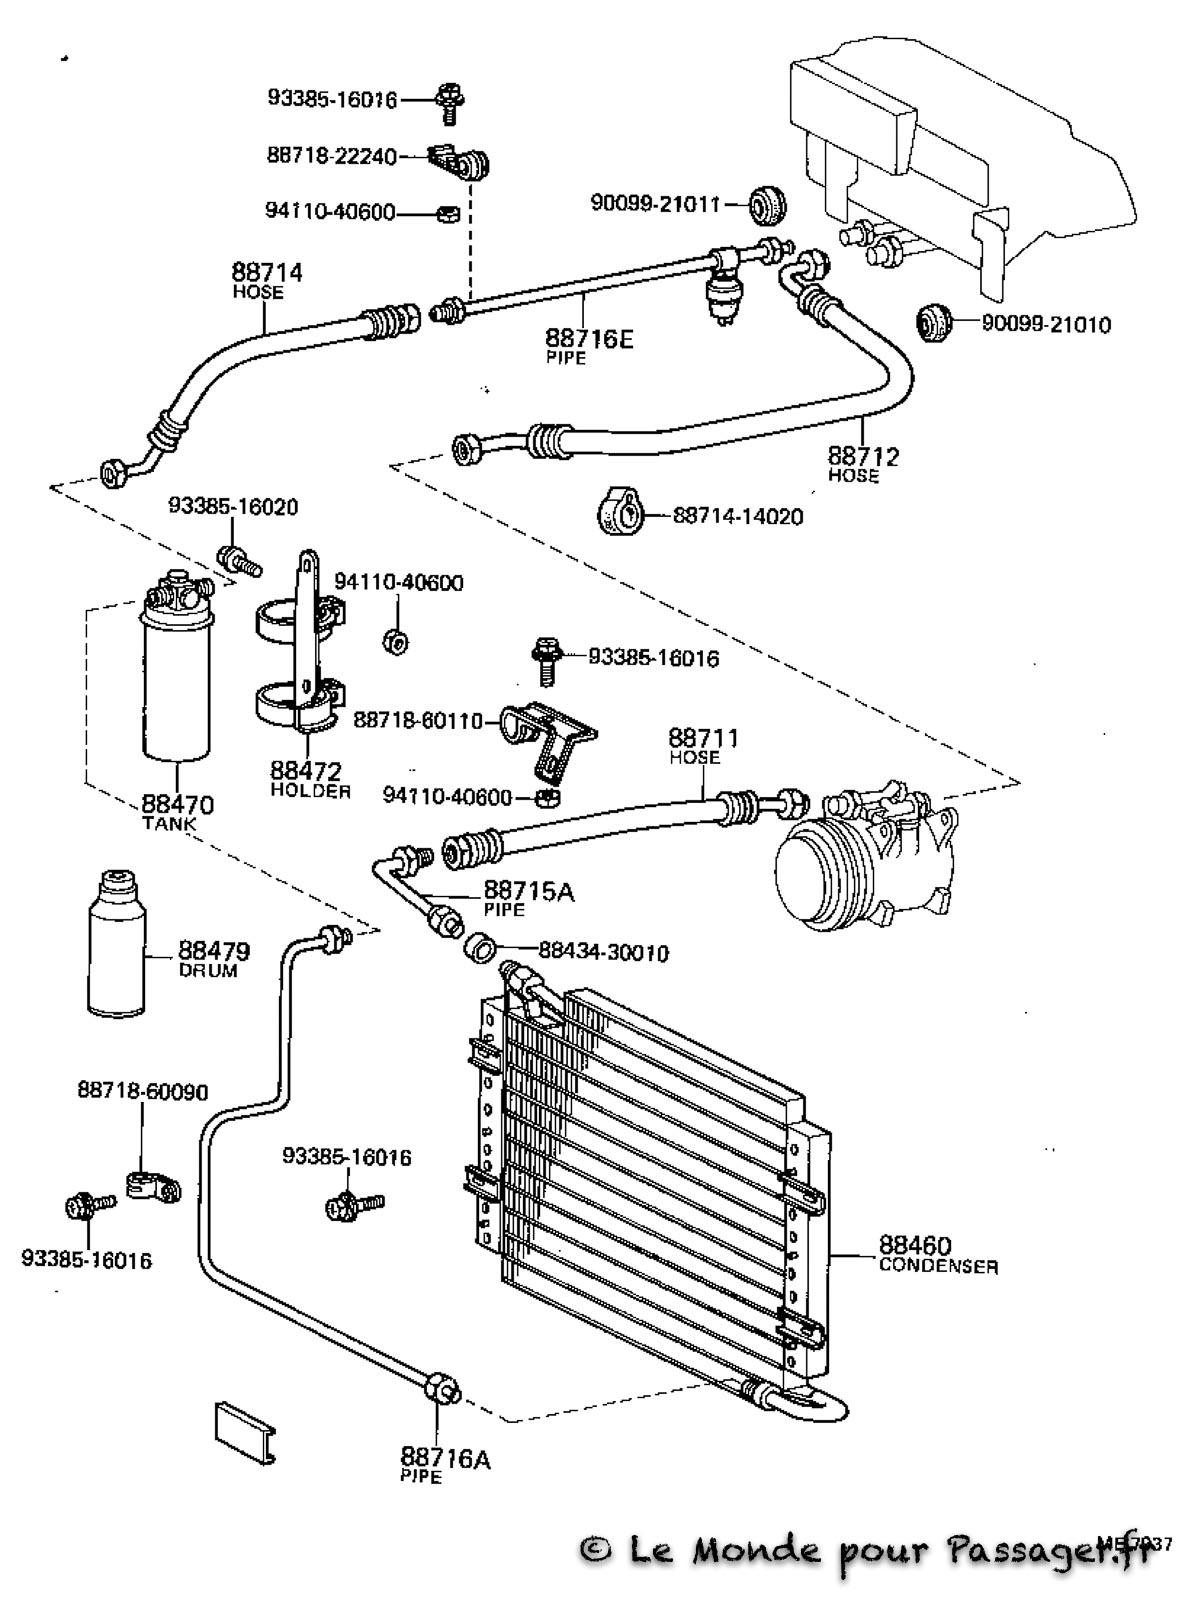 Fj55-Eclatés-Techniques058